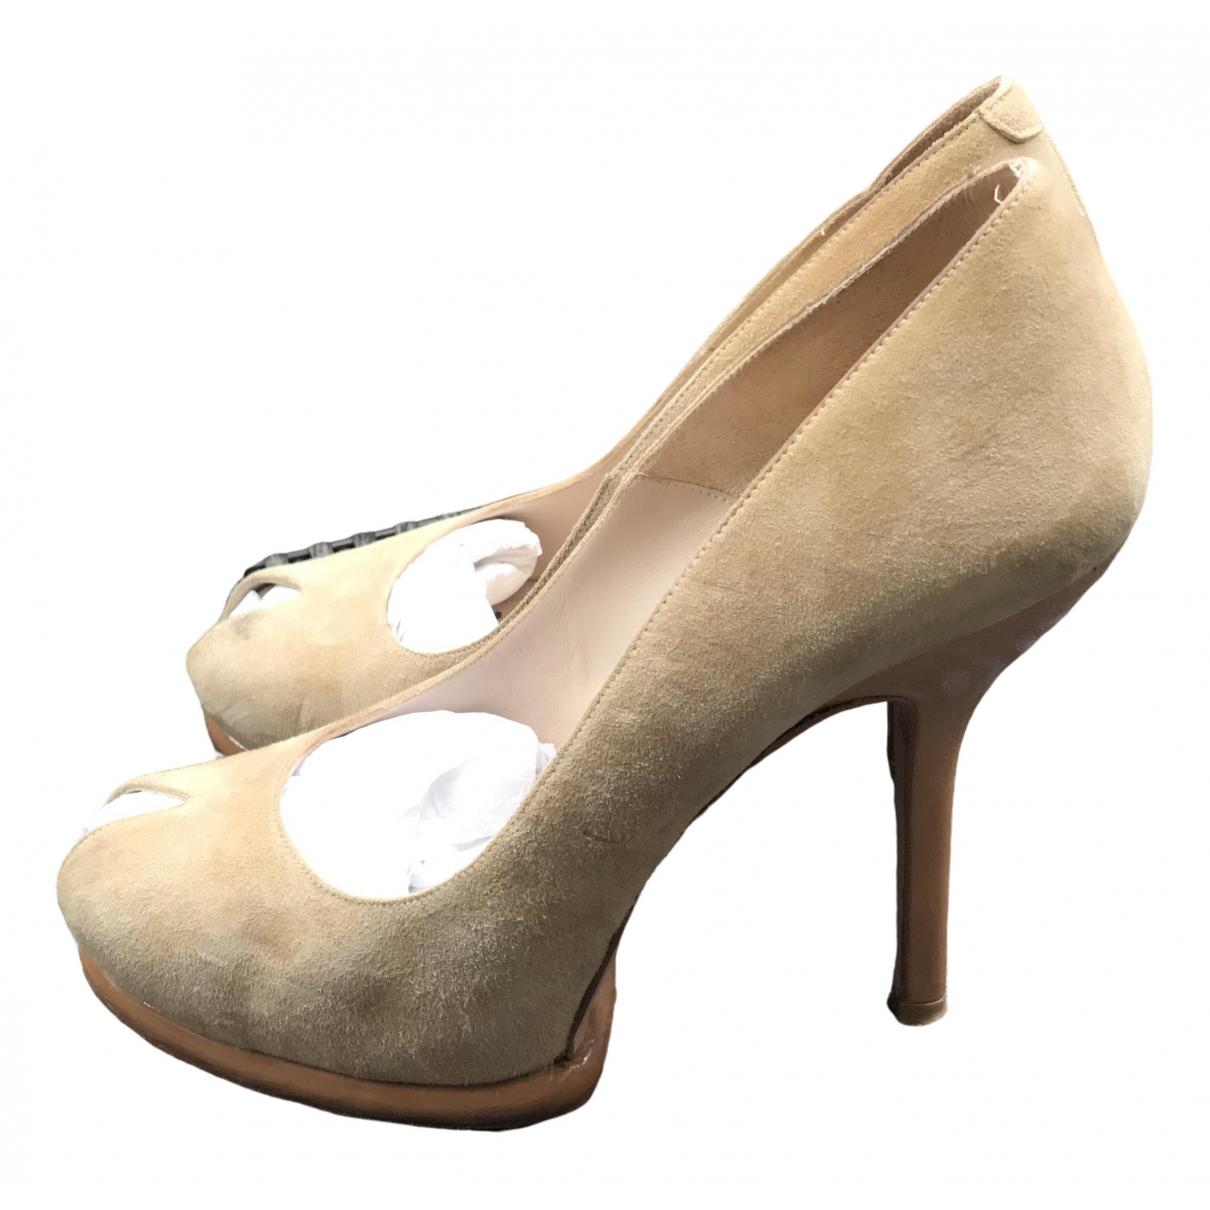 Paco Gil \N Beige Leather Heels for Women 39 EU